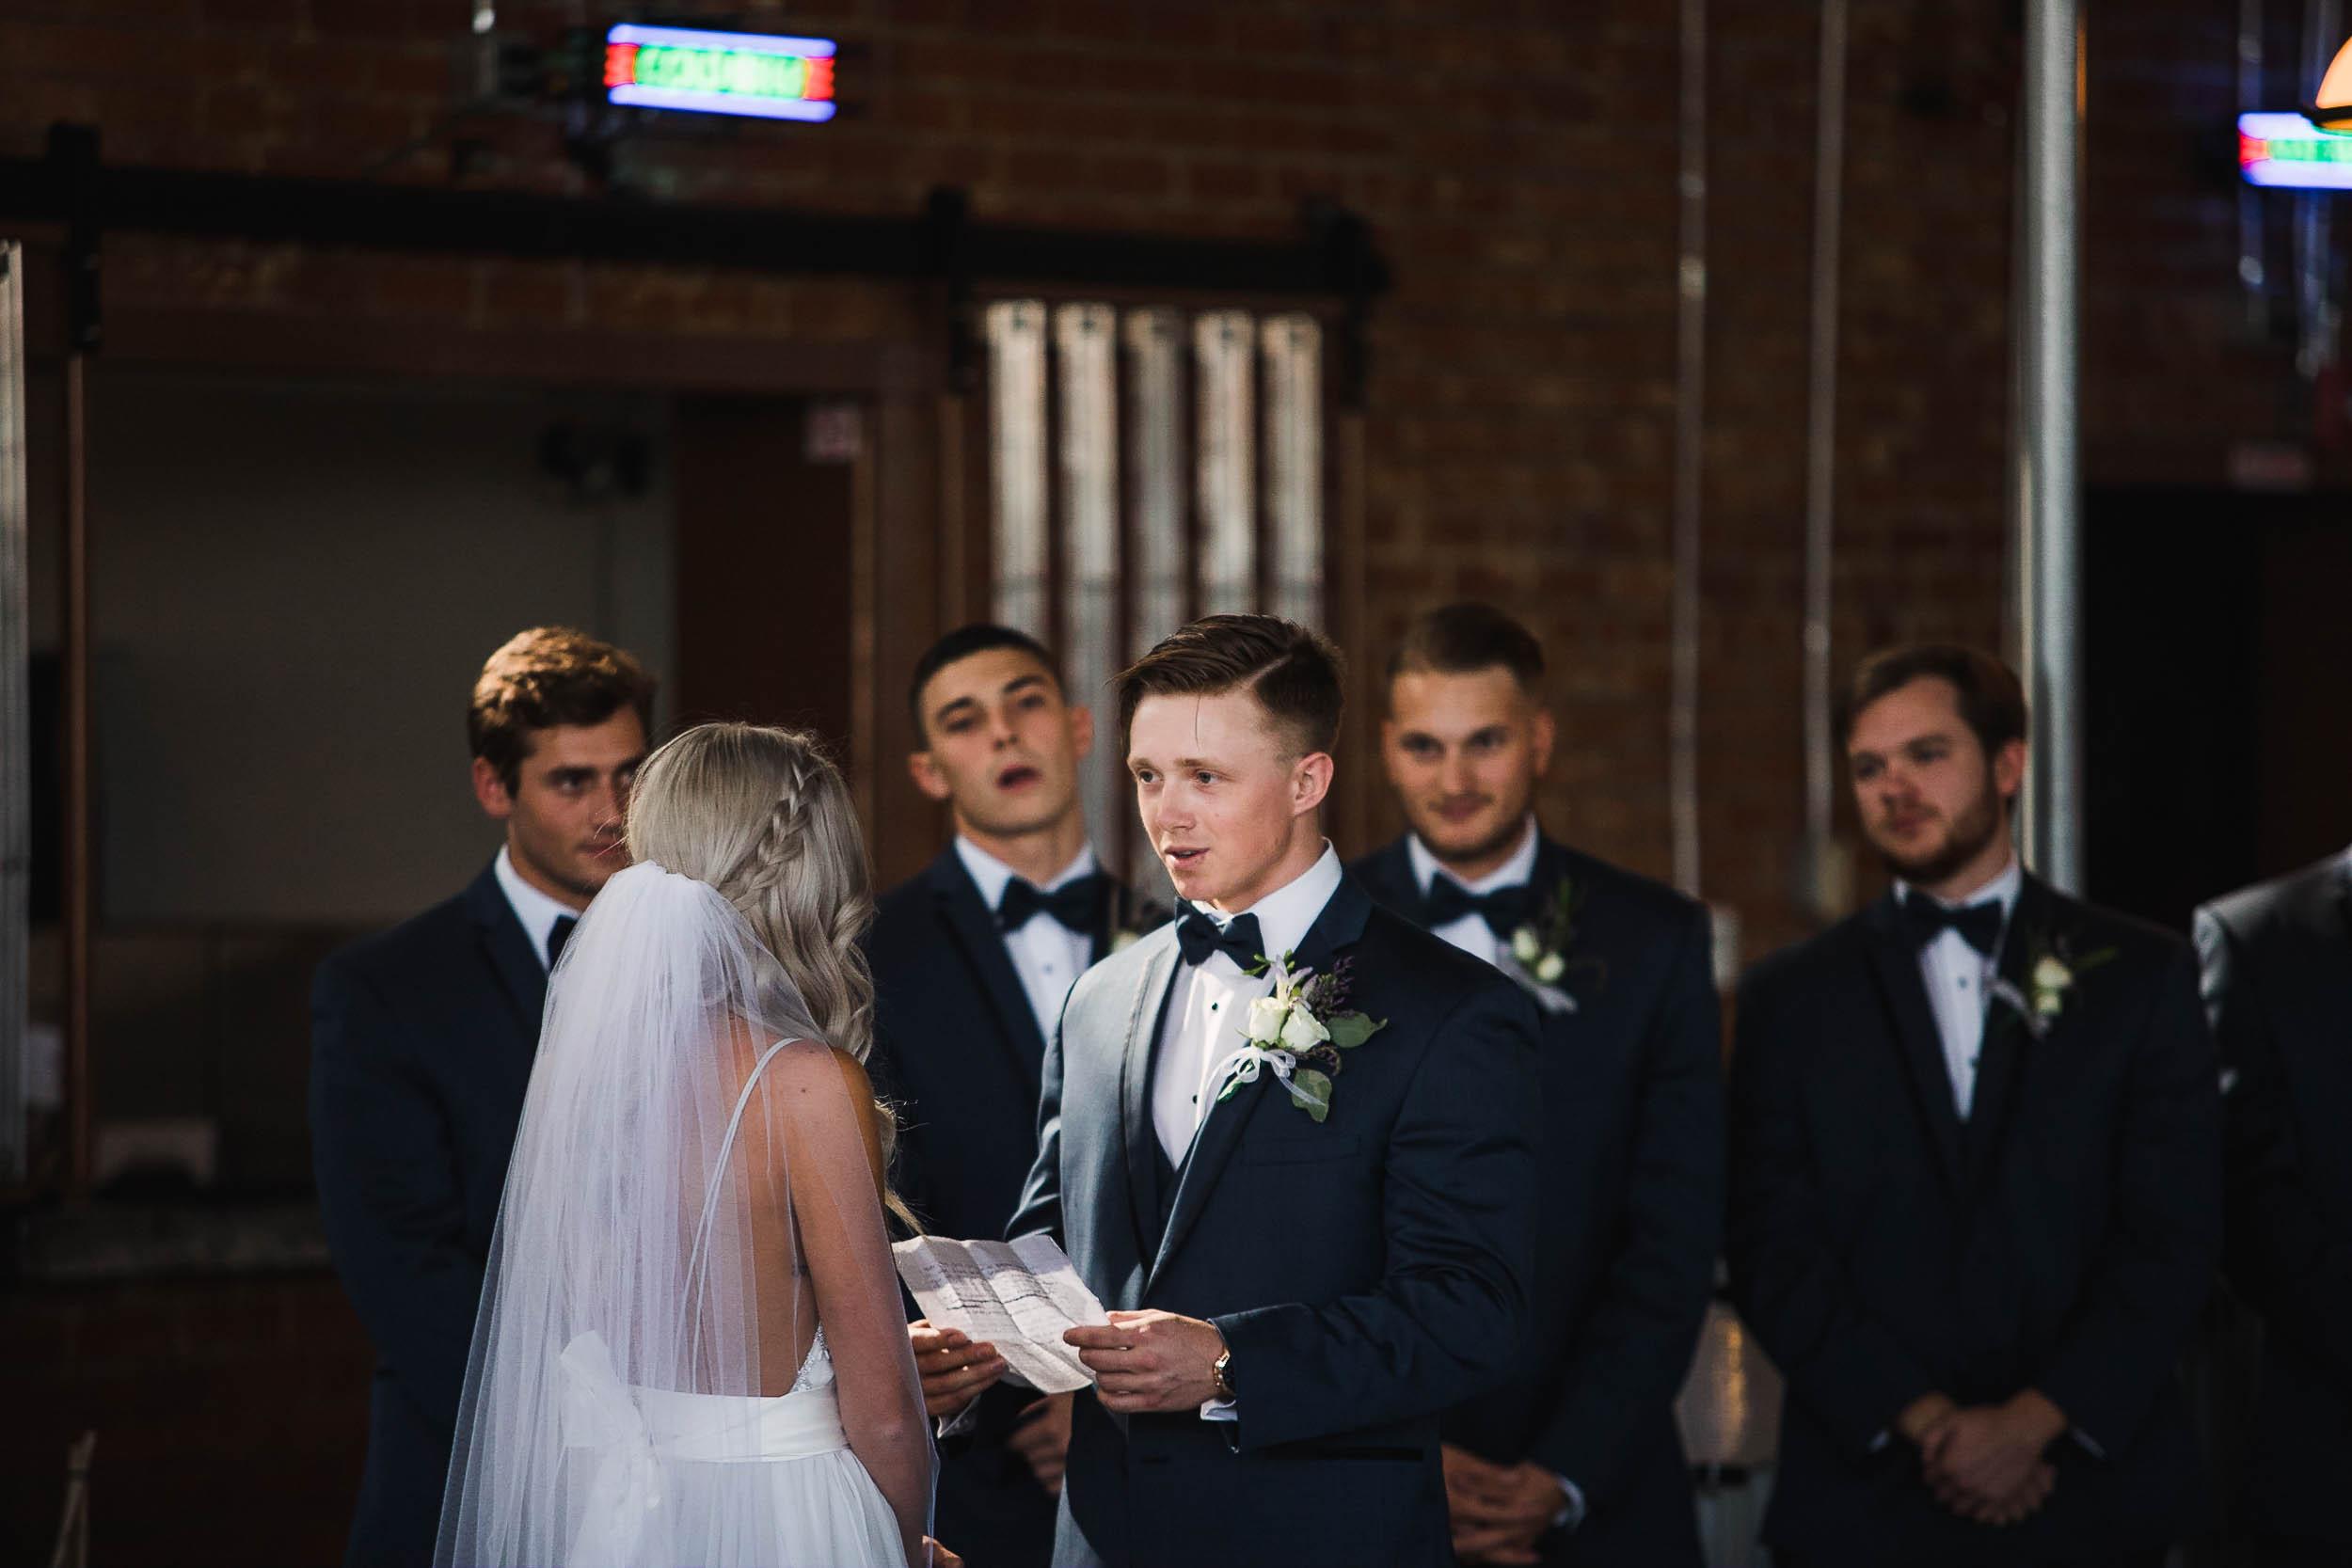 Groom reading wedding vows to his bride